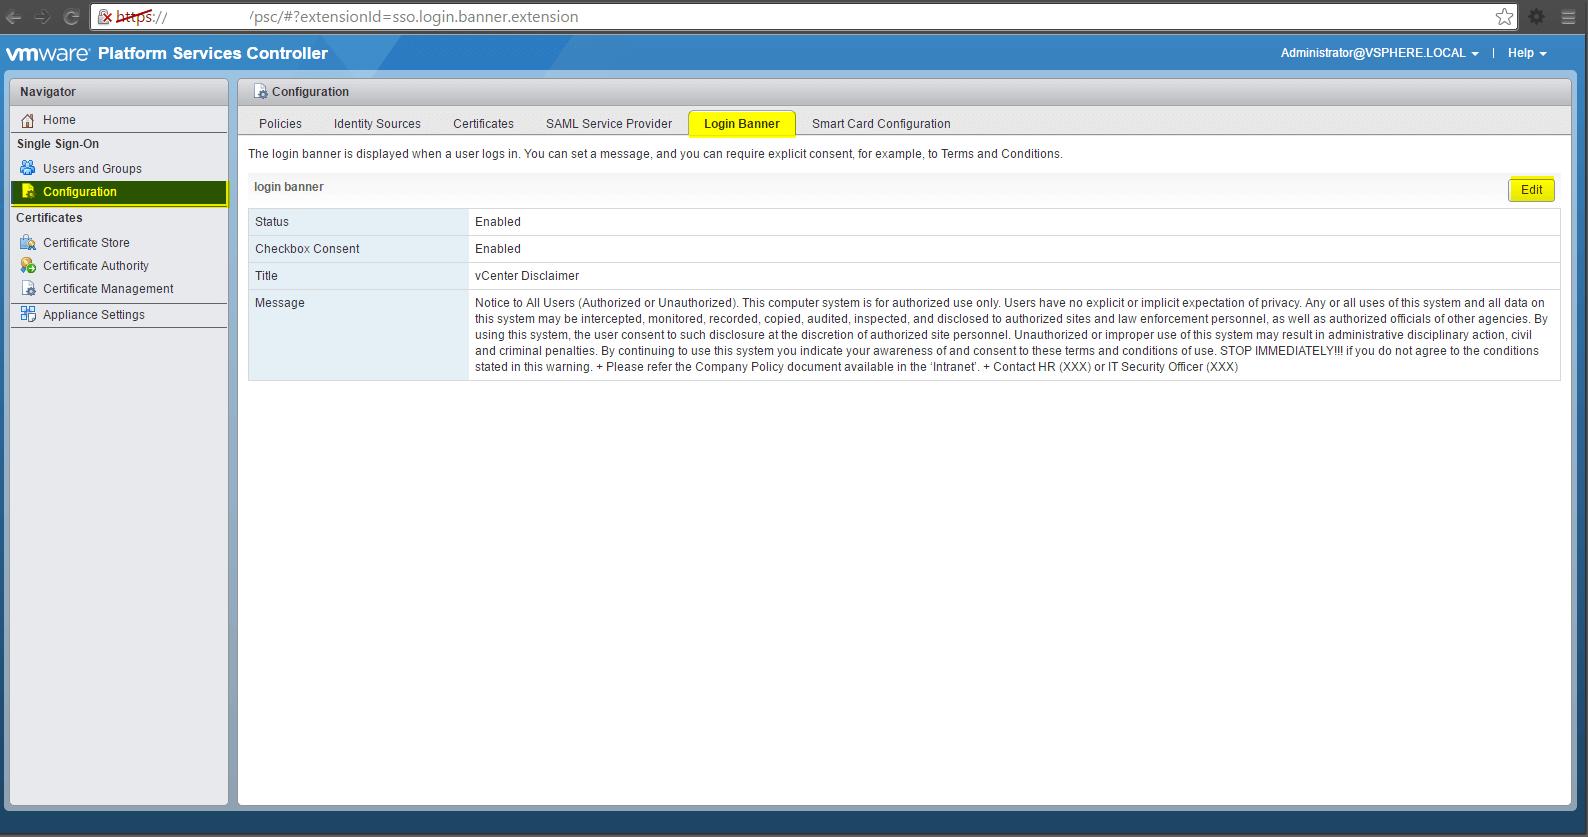 vsphere web client – Almost a ninja